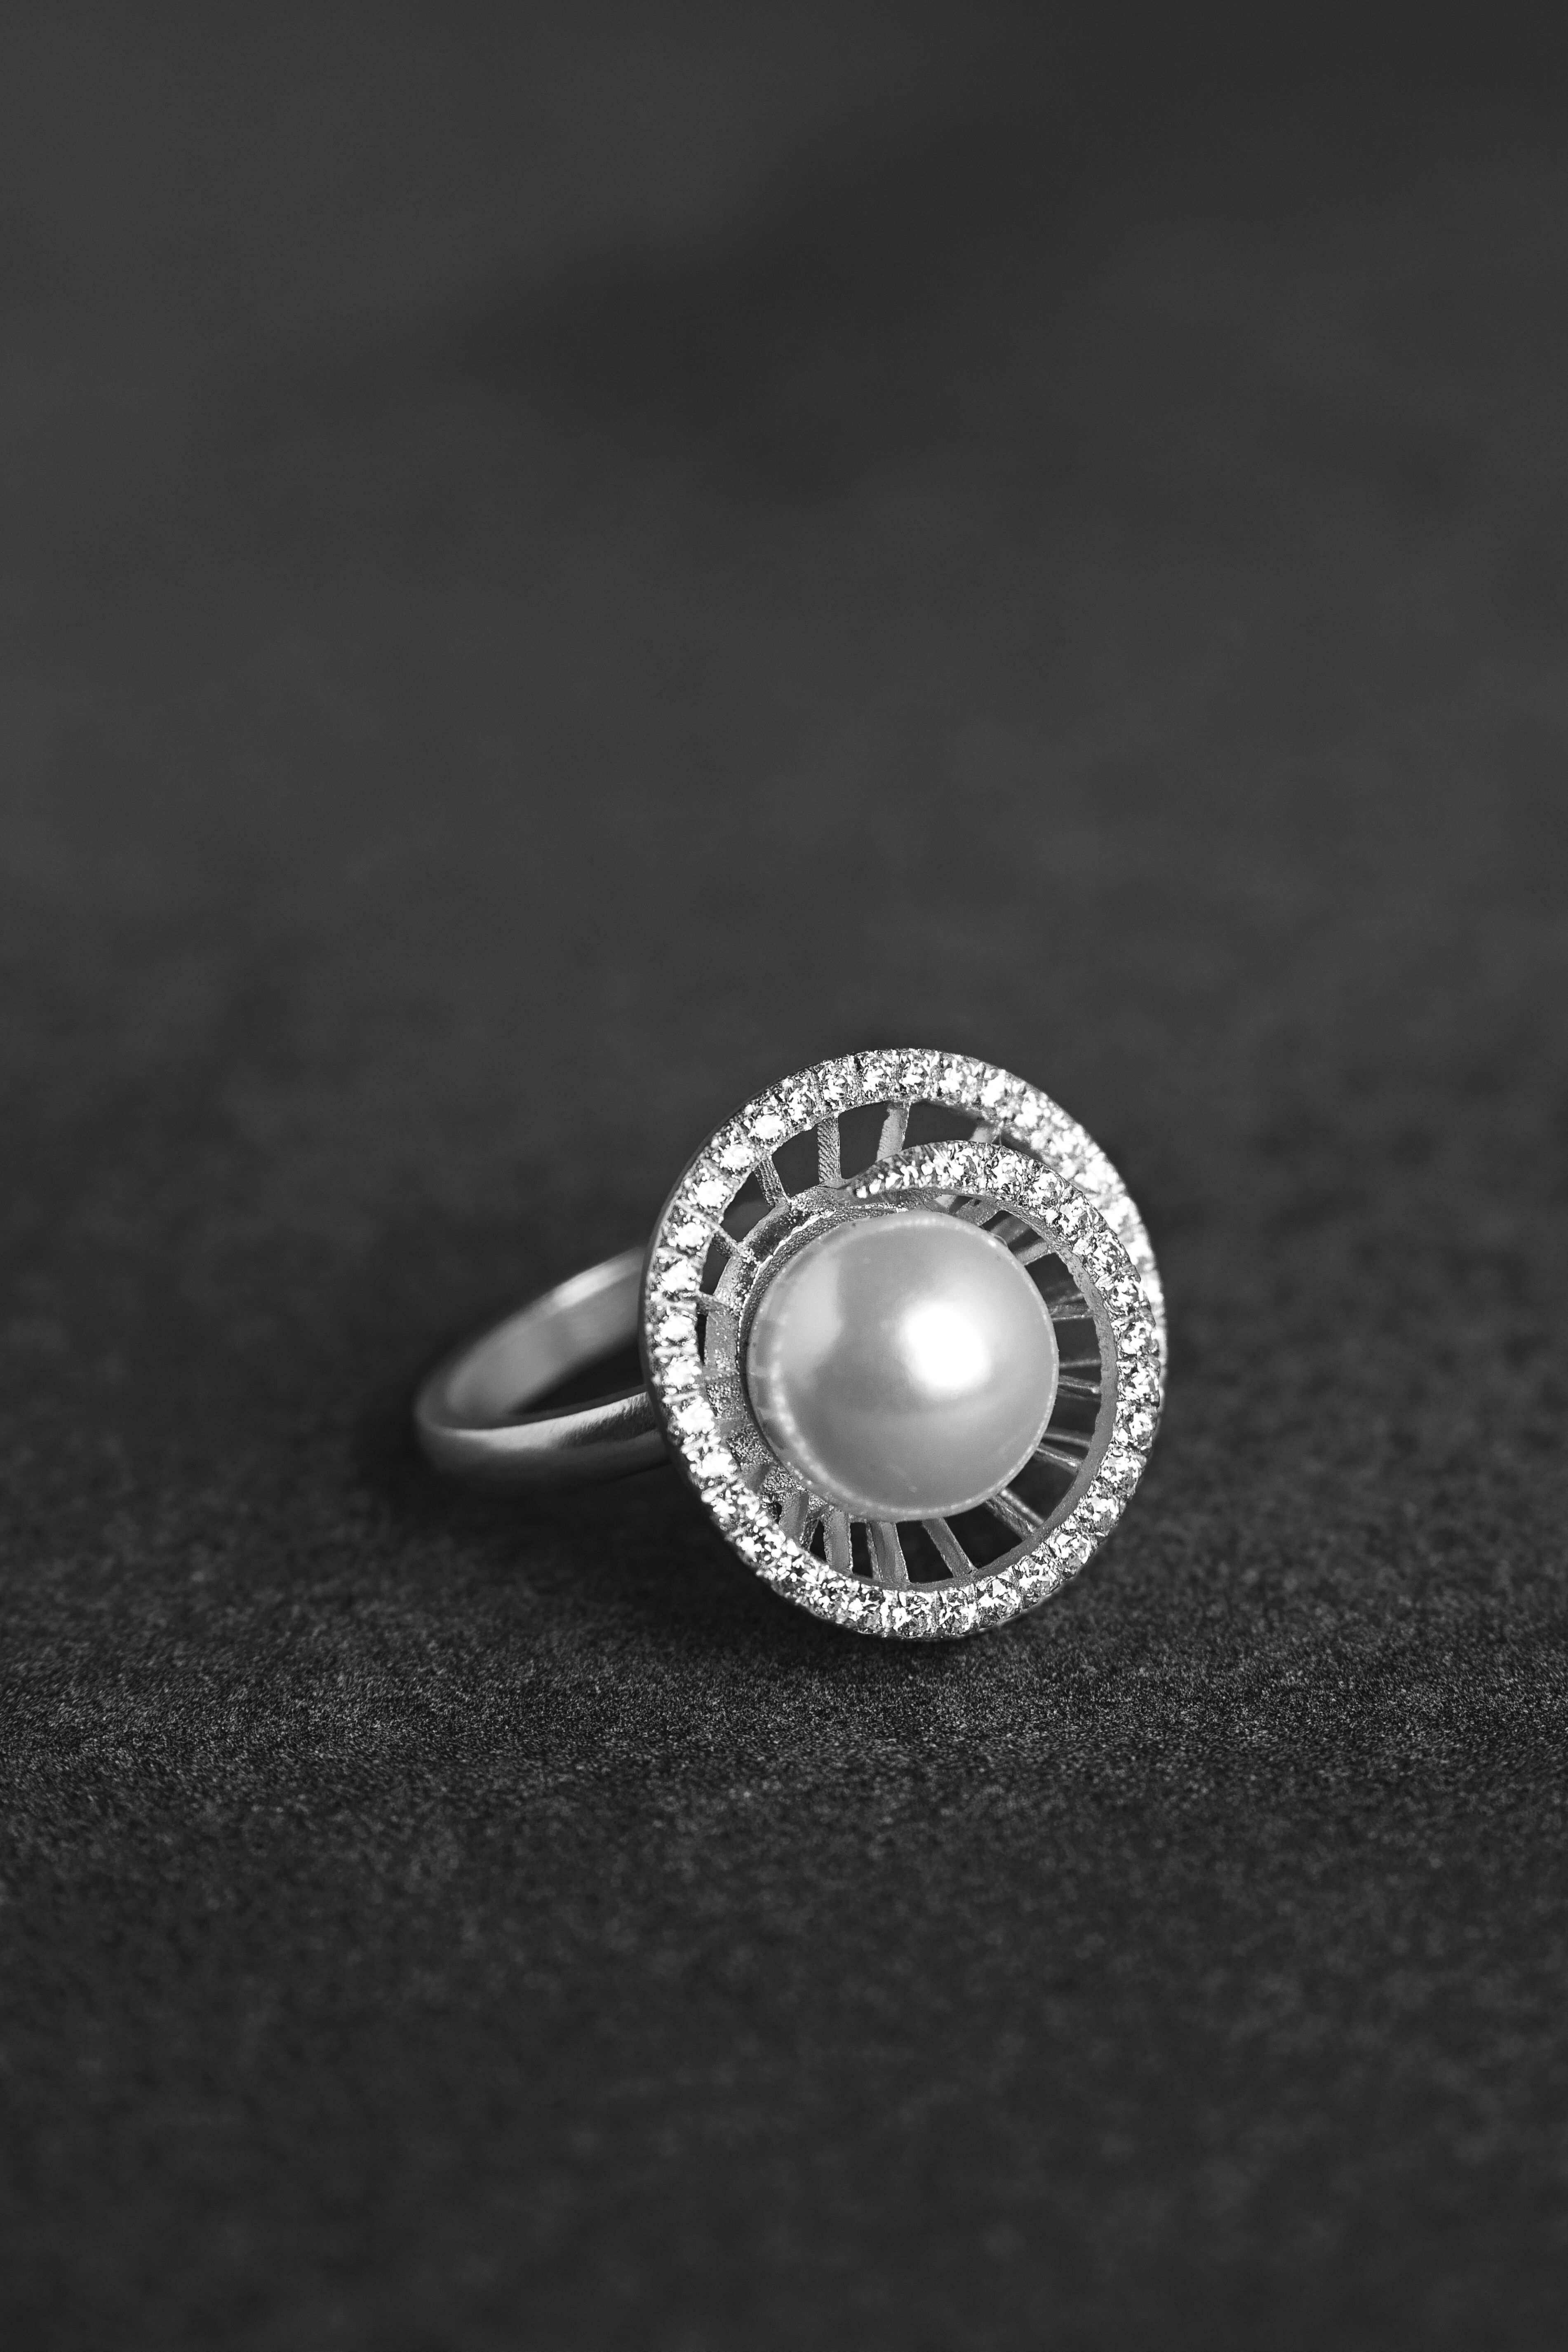 taille 6.5 Moderniste Cultured Pearl /& 14kt Solide Or Jaune Bague